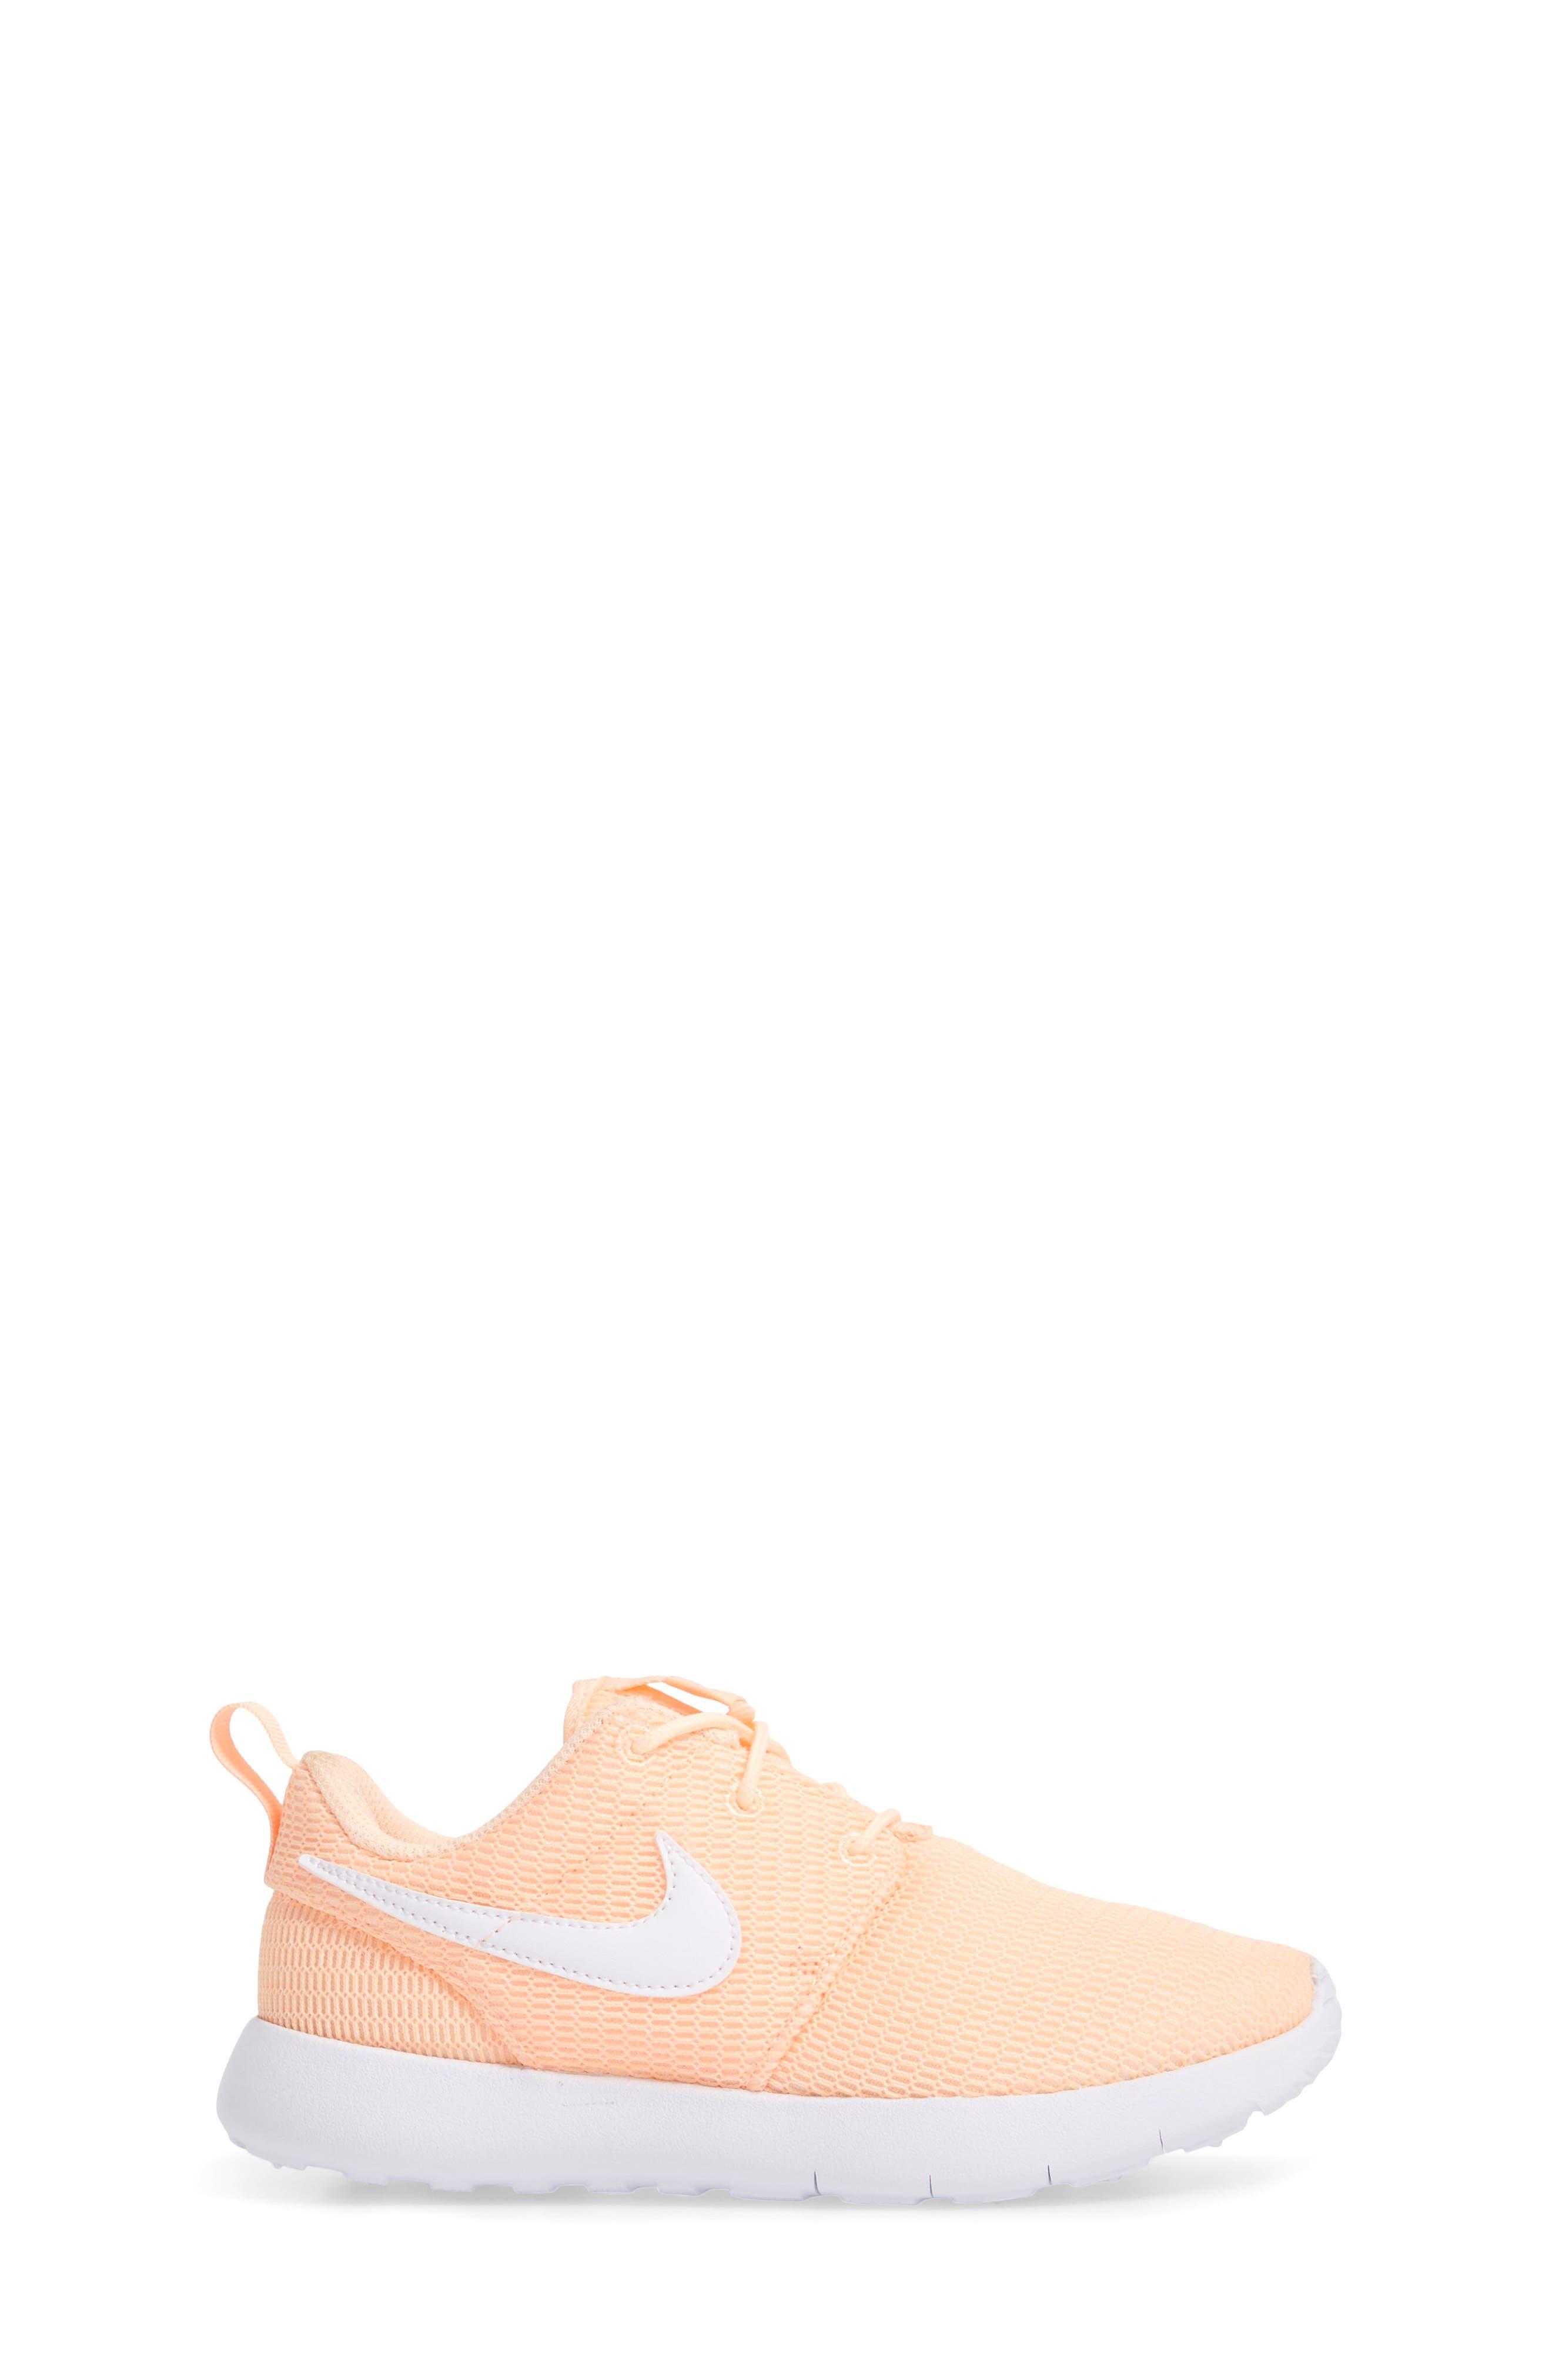 'Roshe Run' Athletic Shoe,                             Alternate thumbnail 115, color,